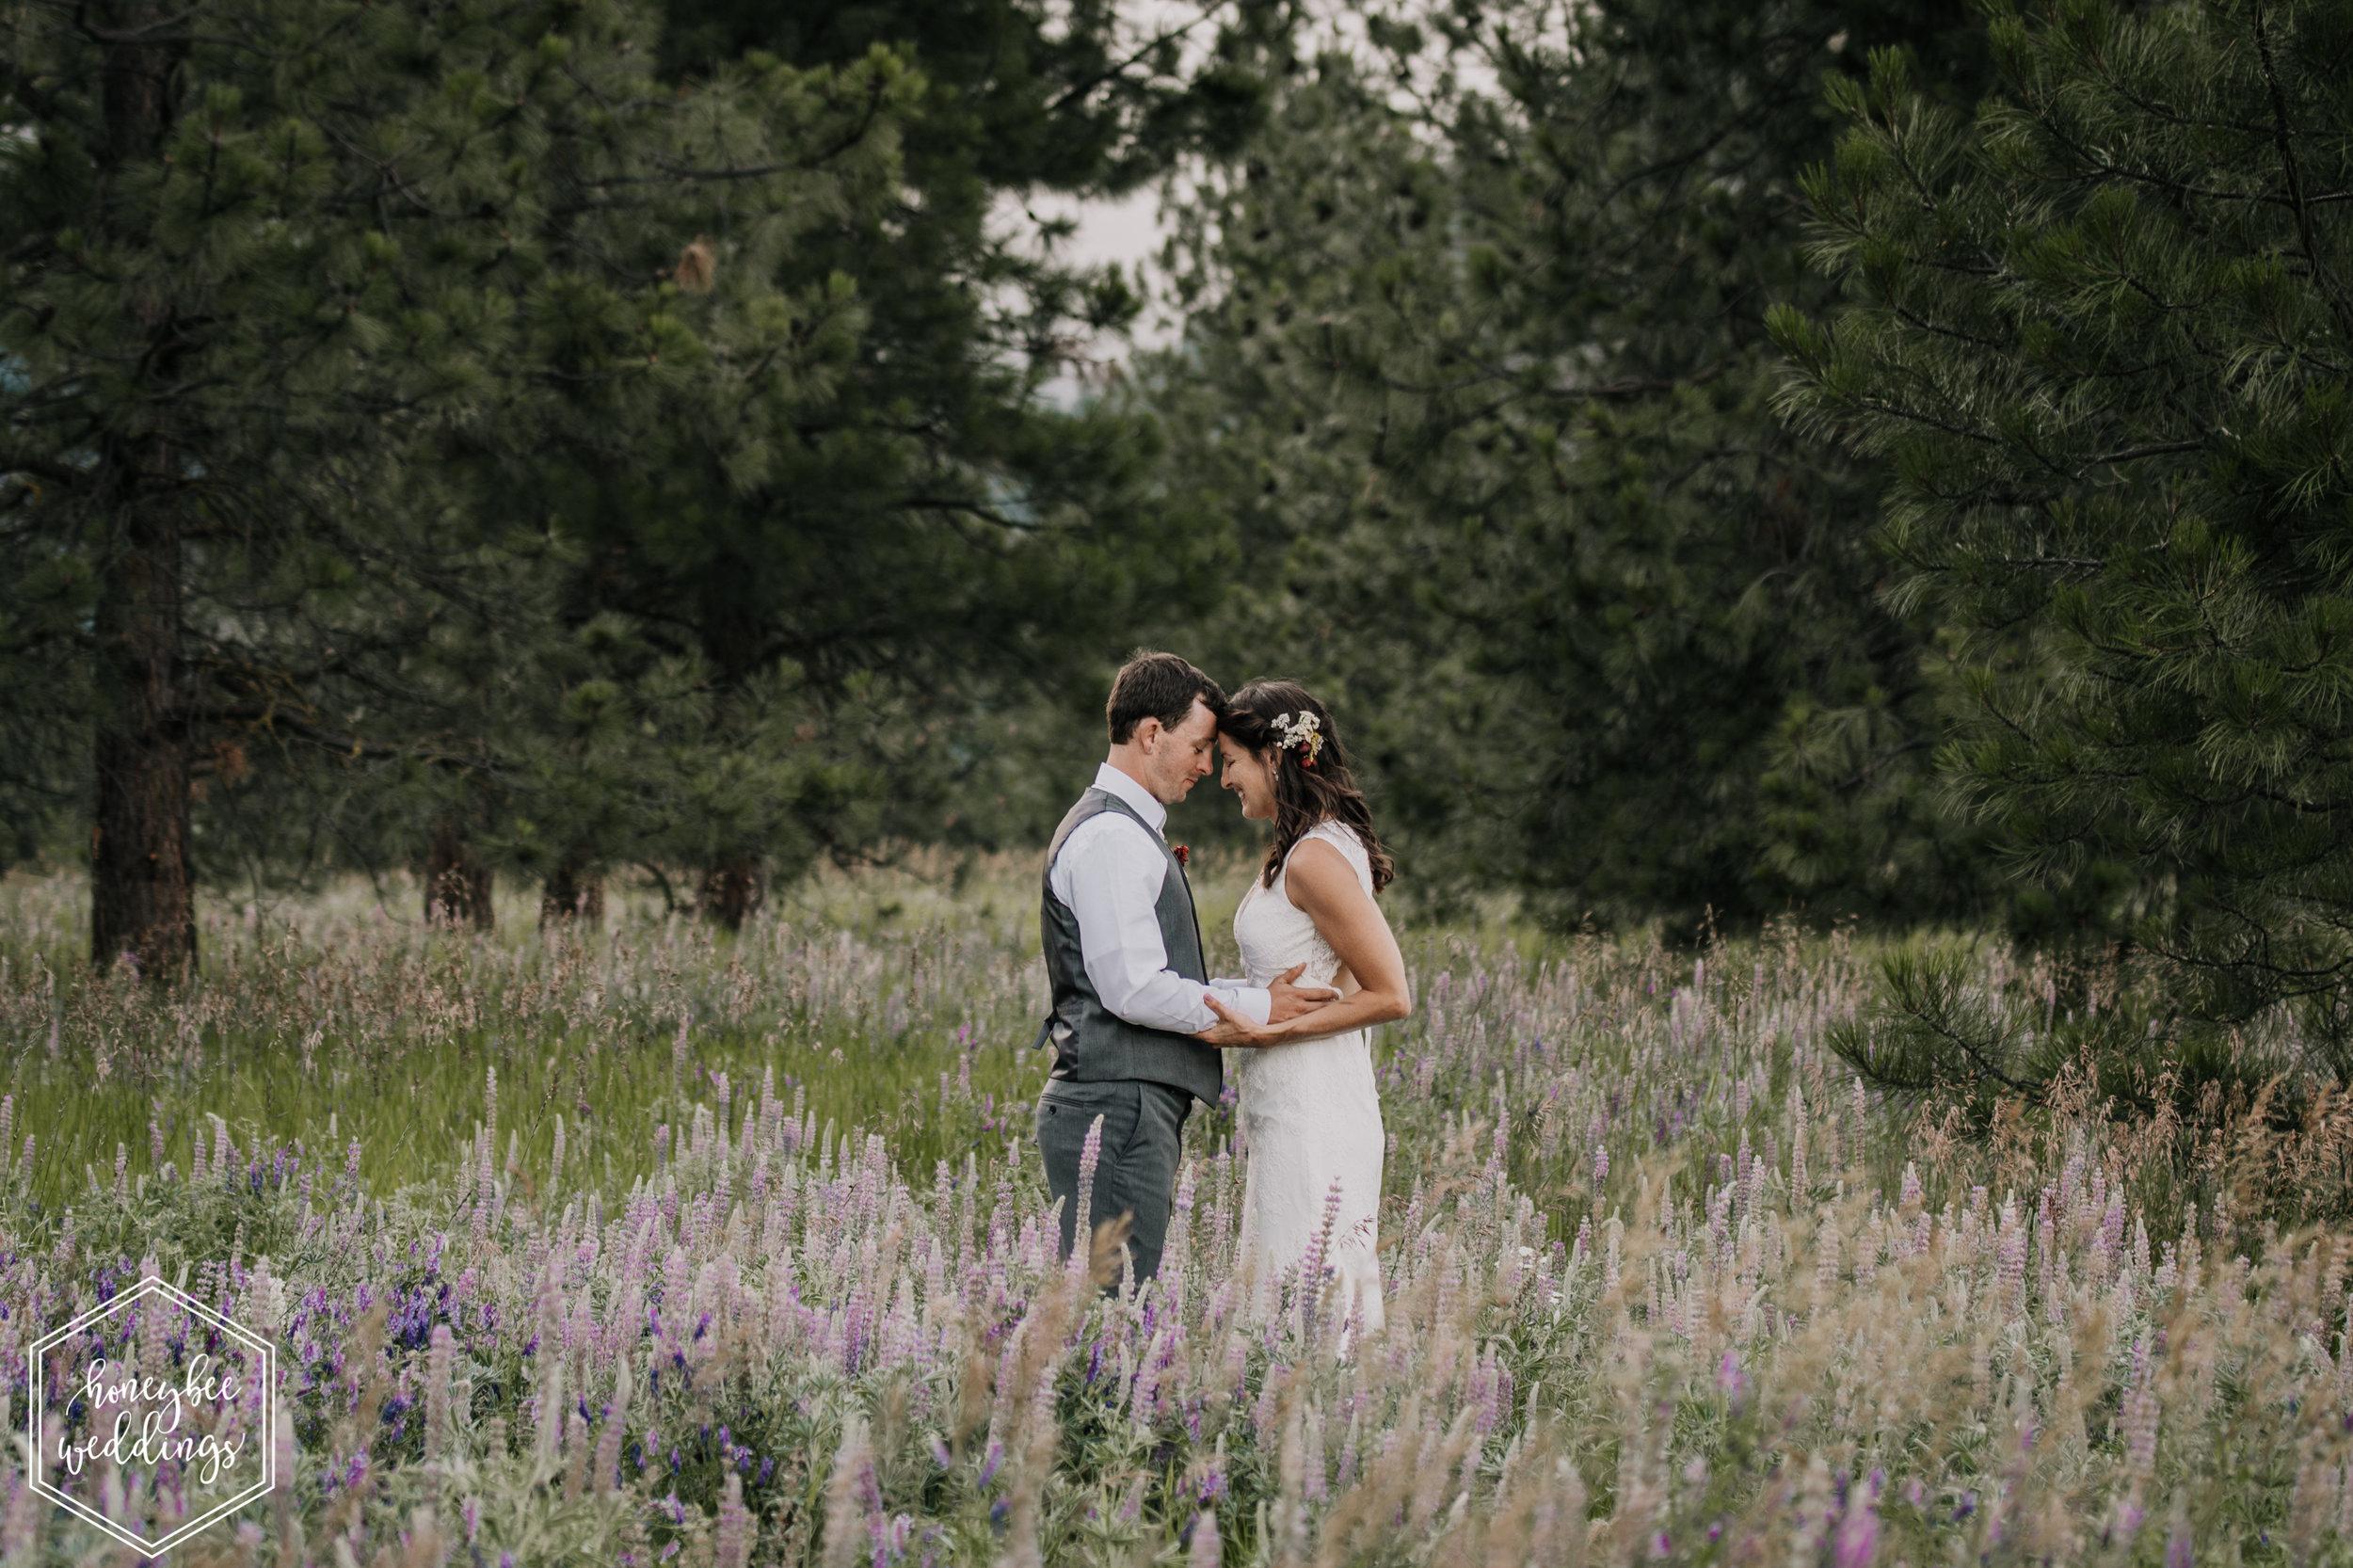 549 White Raven Wedding_Montana Wedding Photographer_Honeybee Weddings_ Meghan Maloney + Arza Hammond 2018-0216.jpg